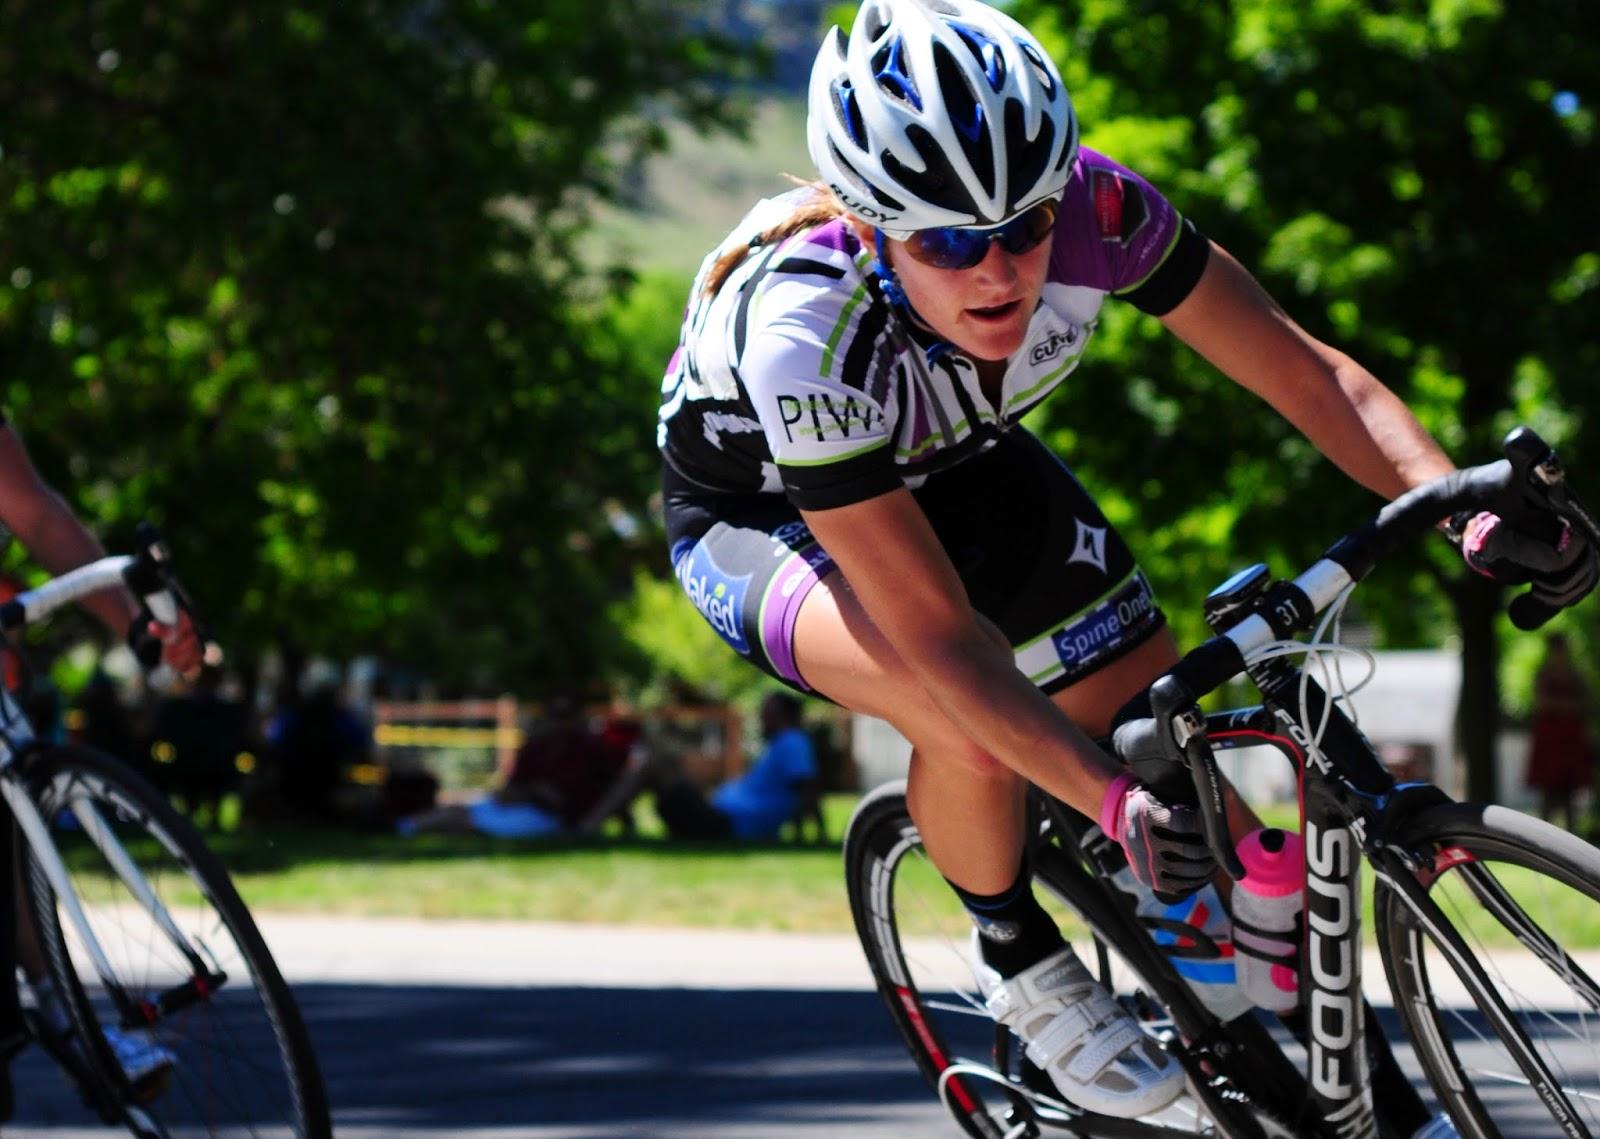 HerbalyFamily: Skylars first official bike ride